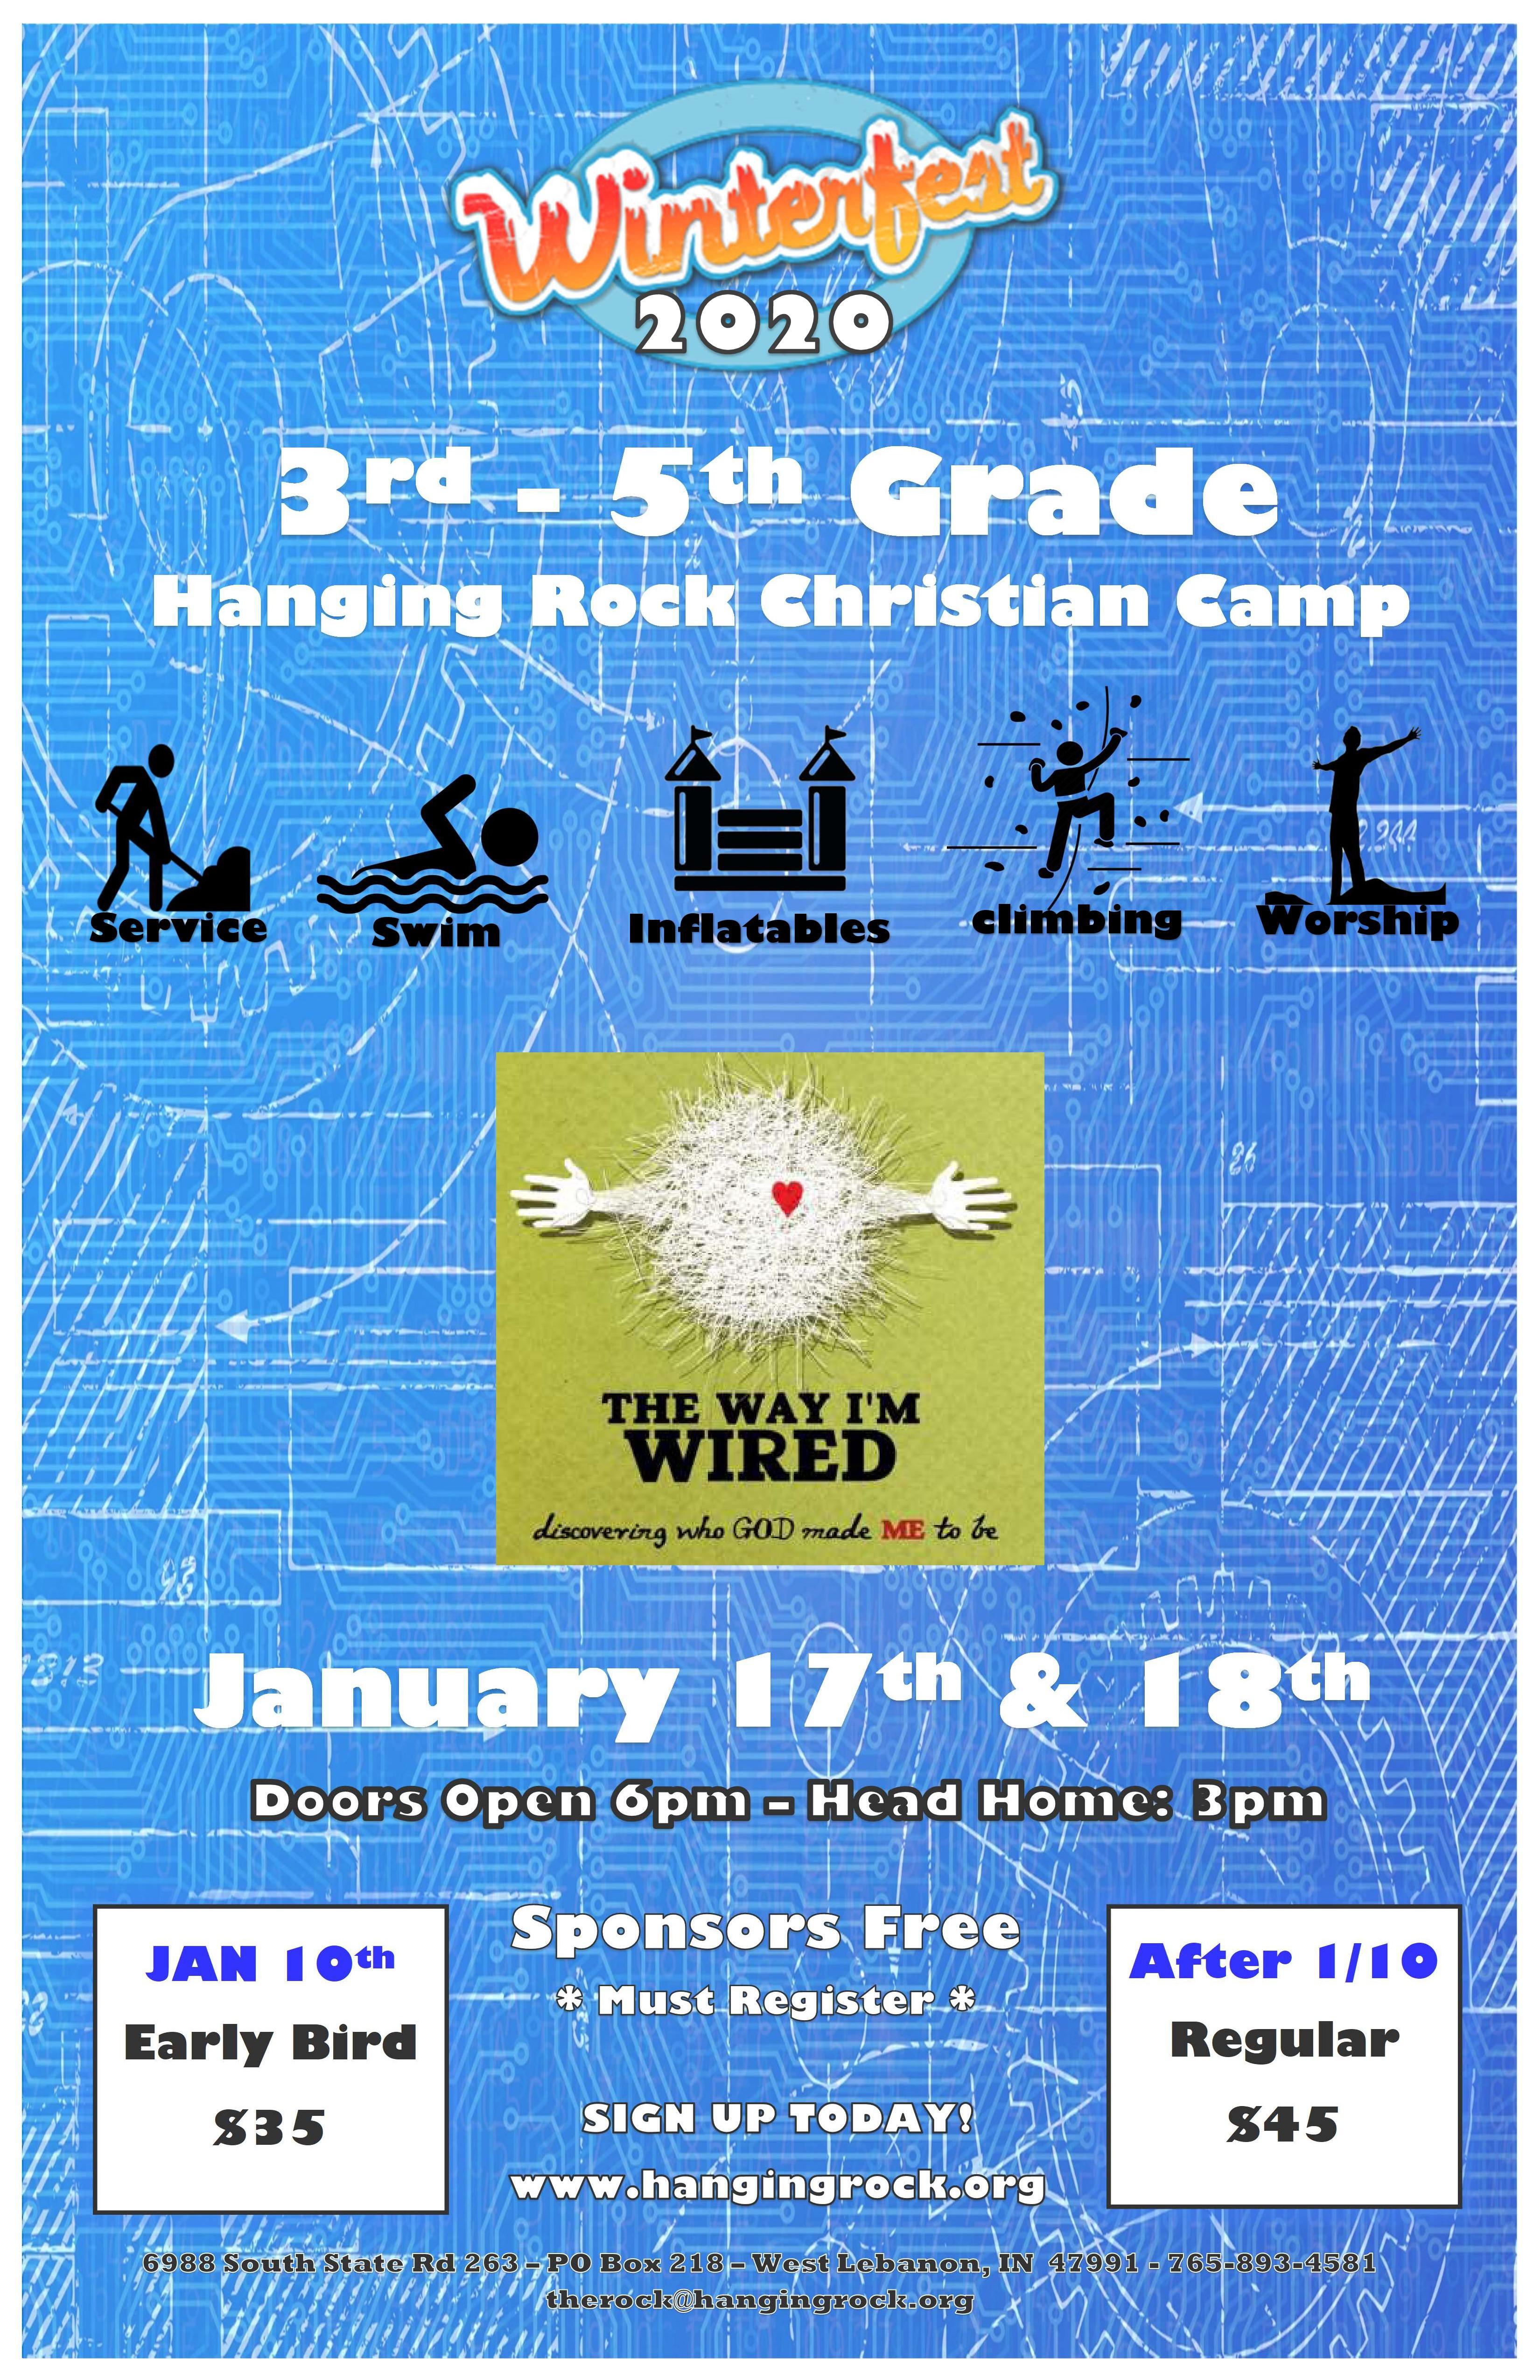 3rd -5th Grade WinterFest